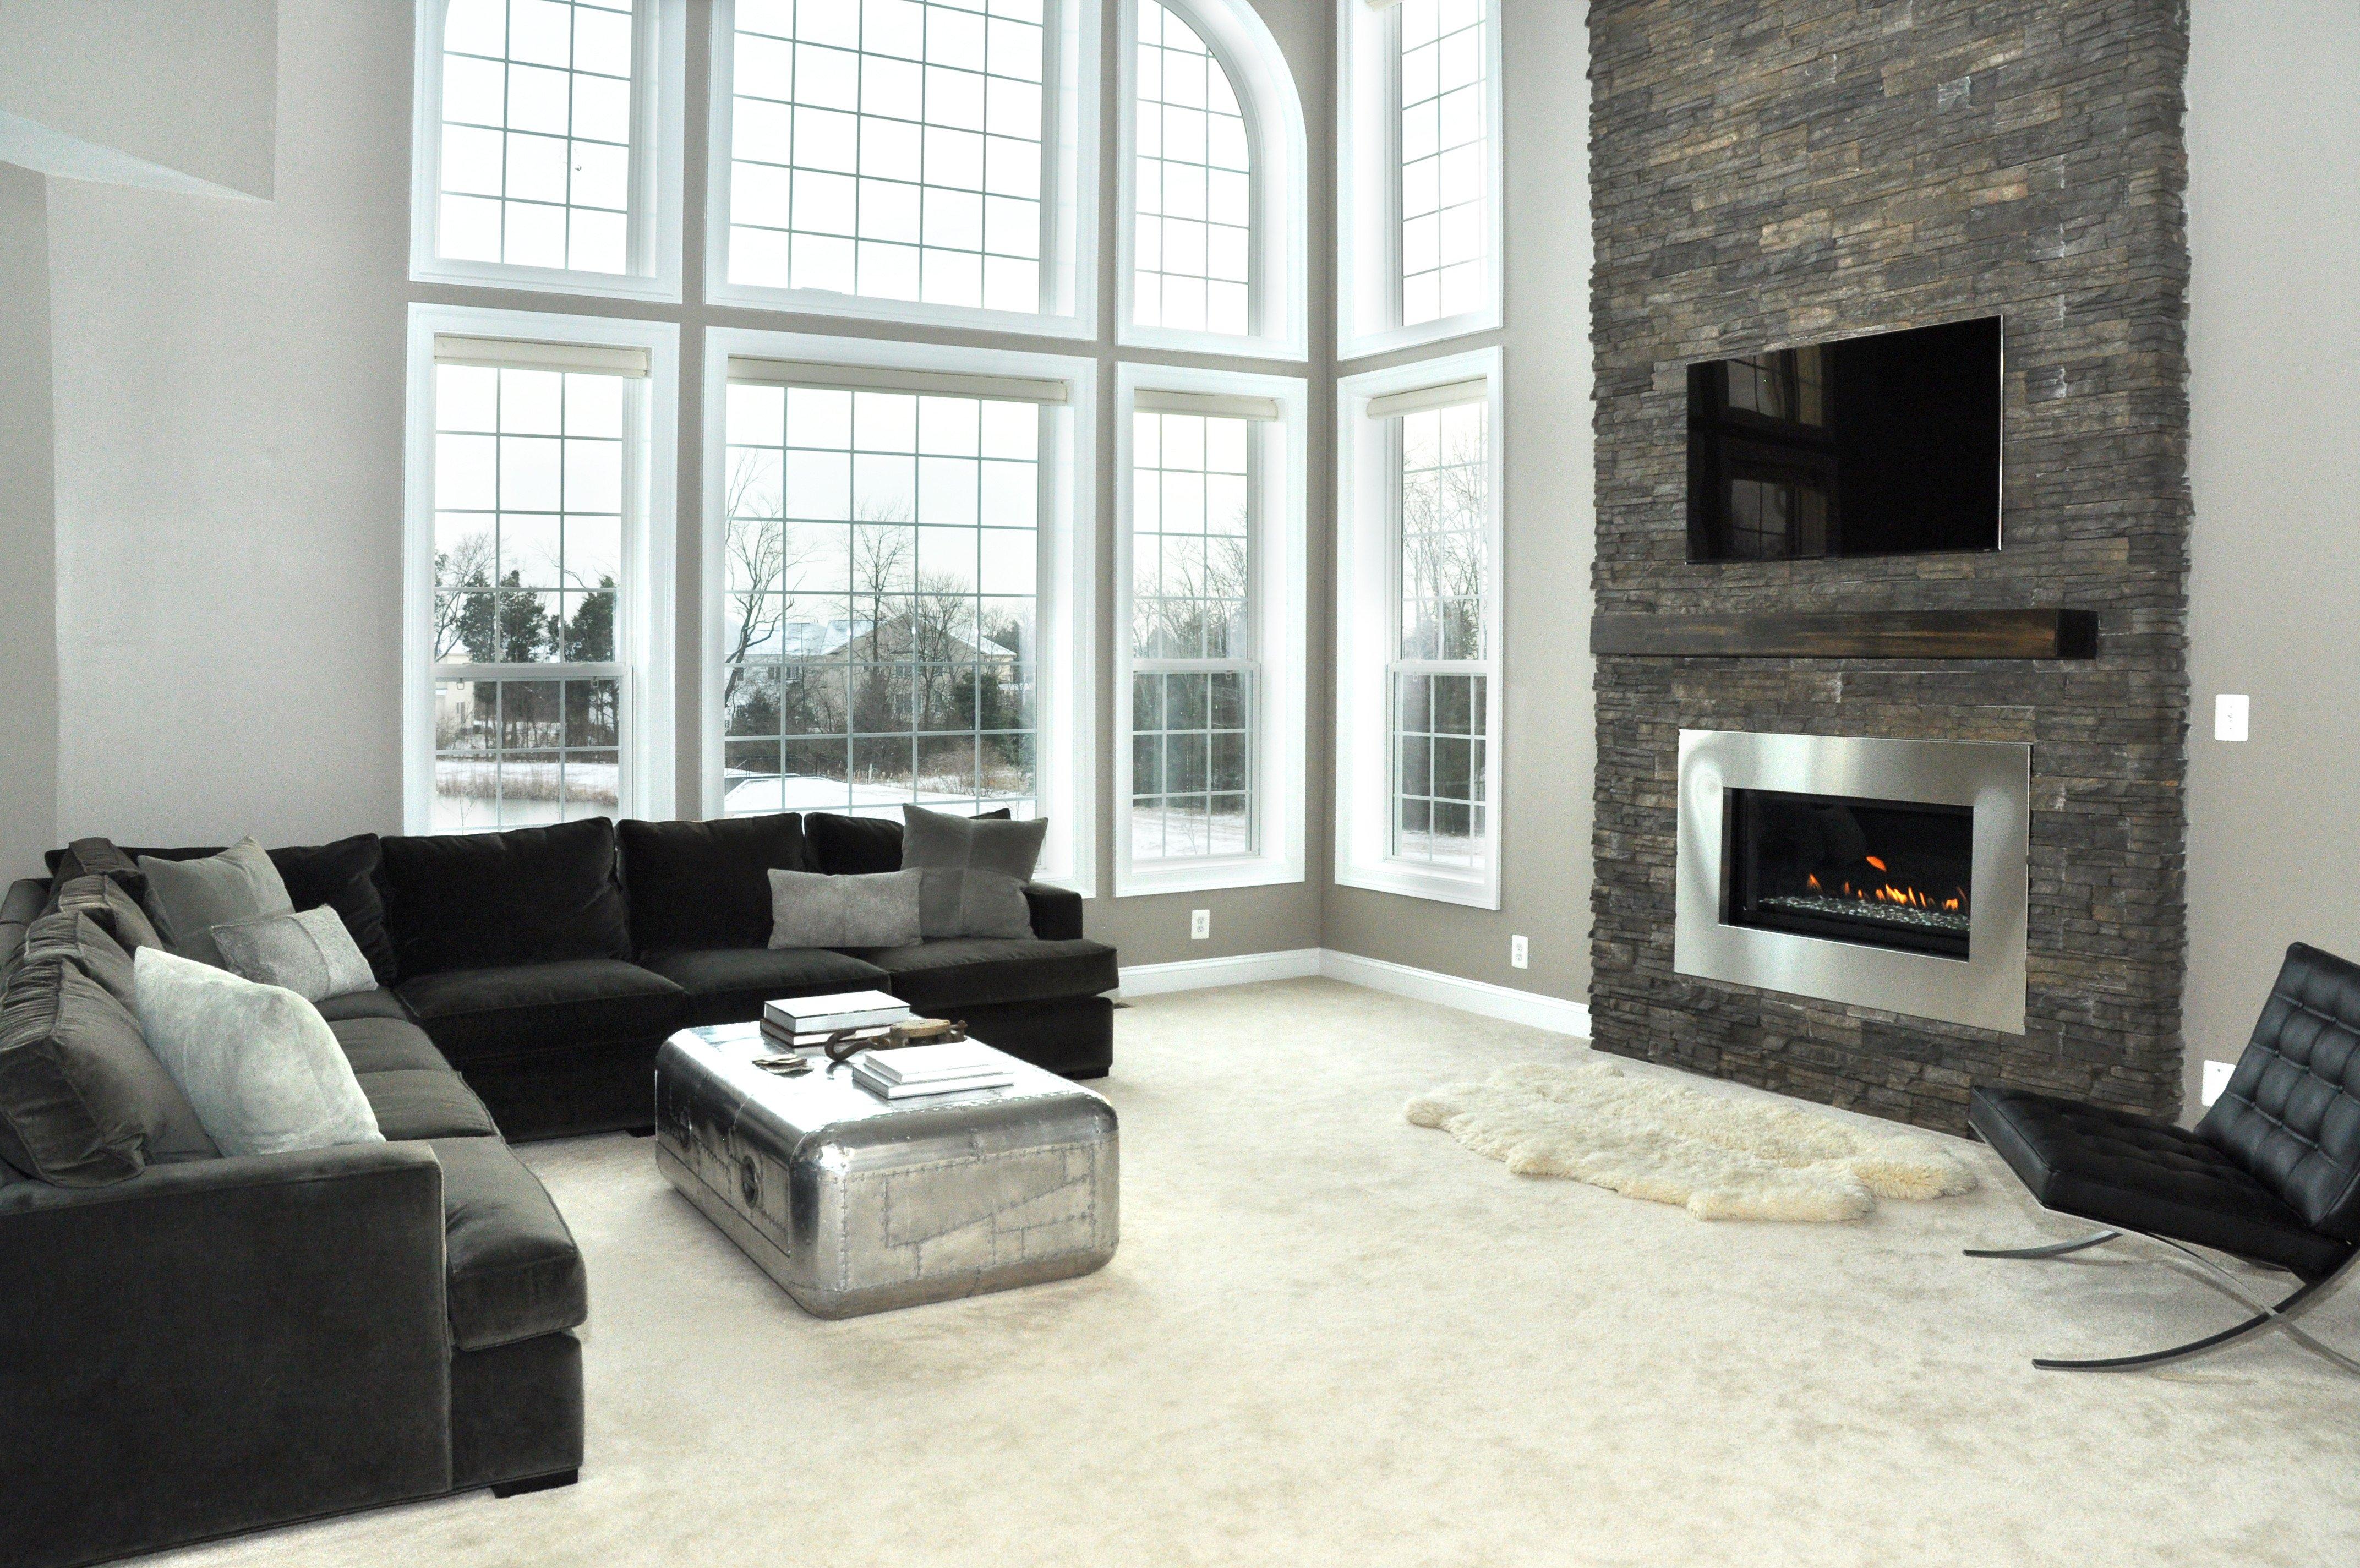 Contemporary Living Room Fireplace Inspirational Modern Fireplace Renovation